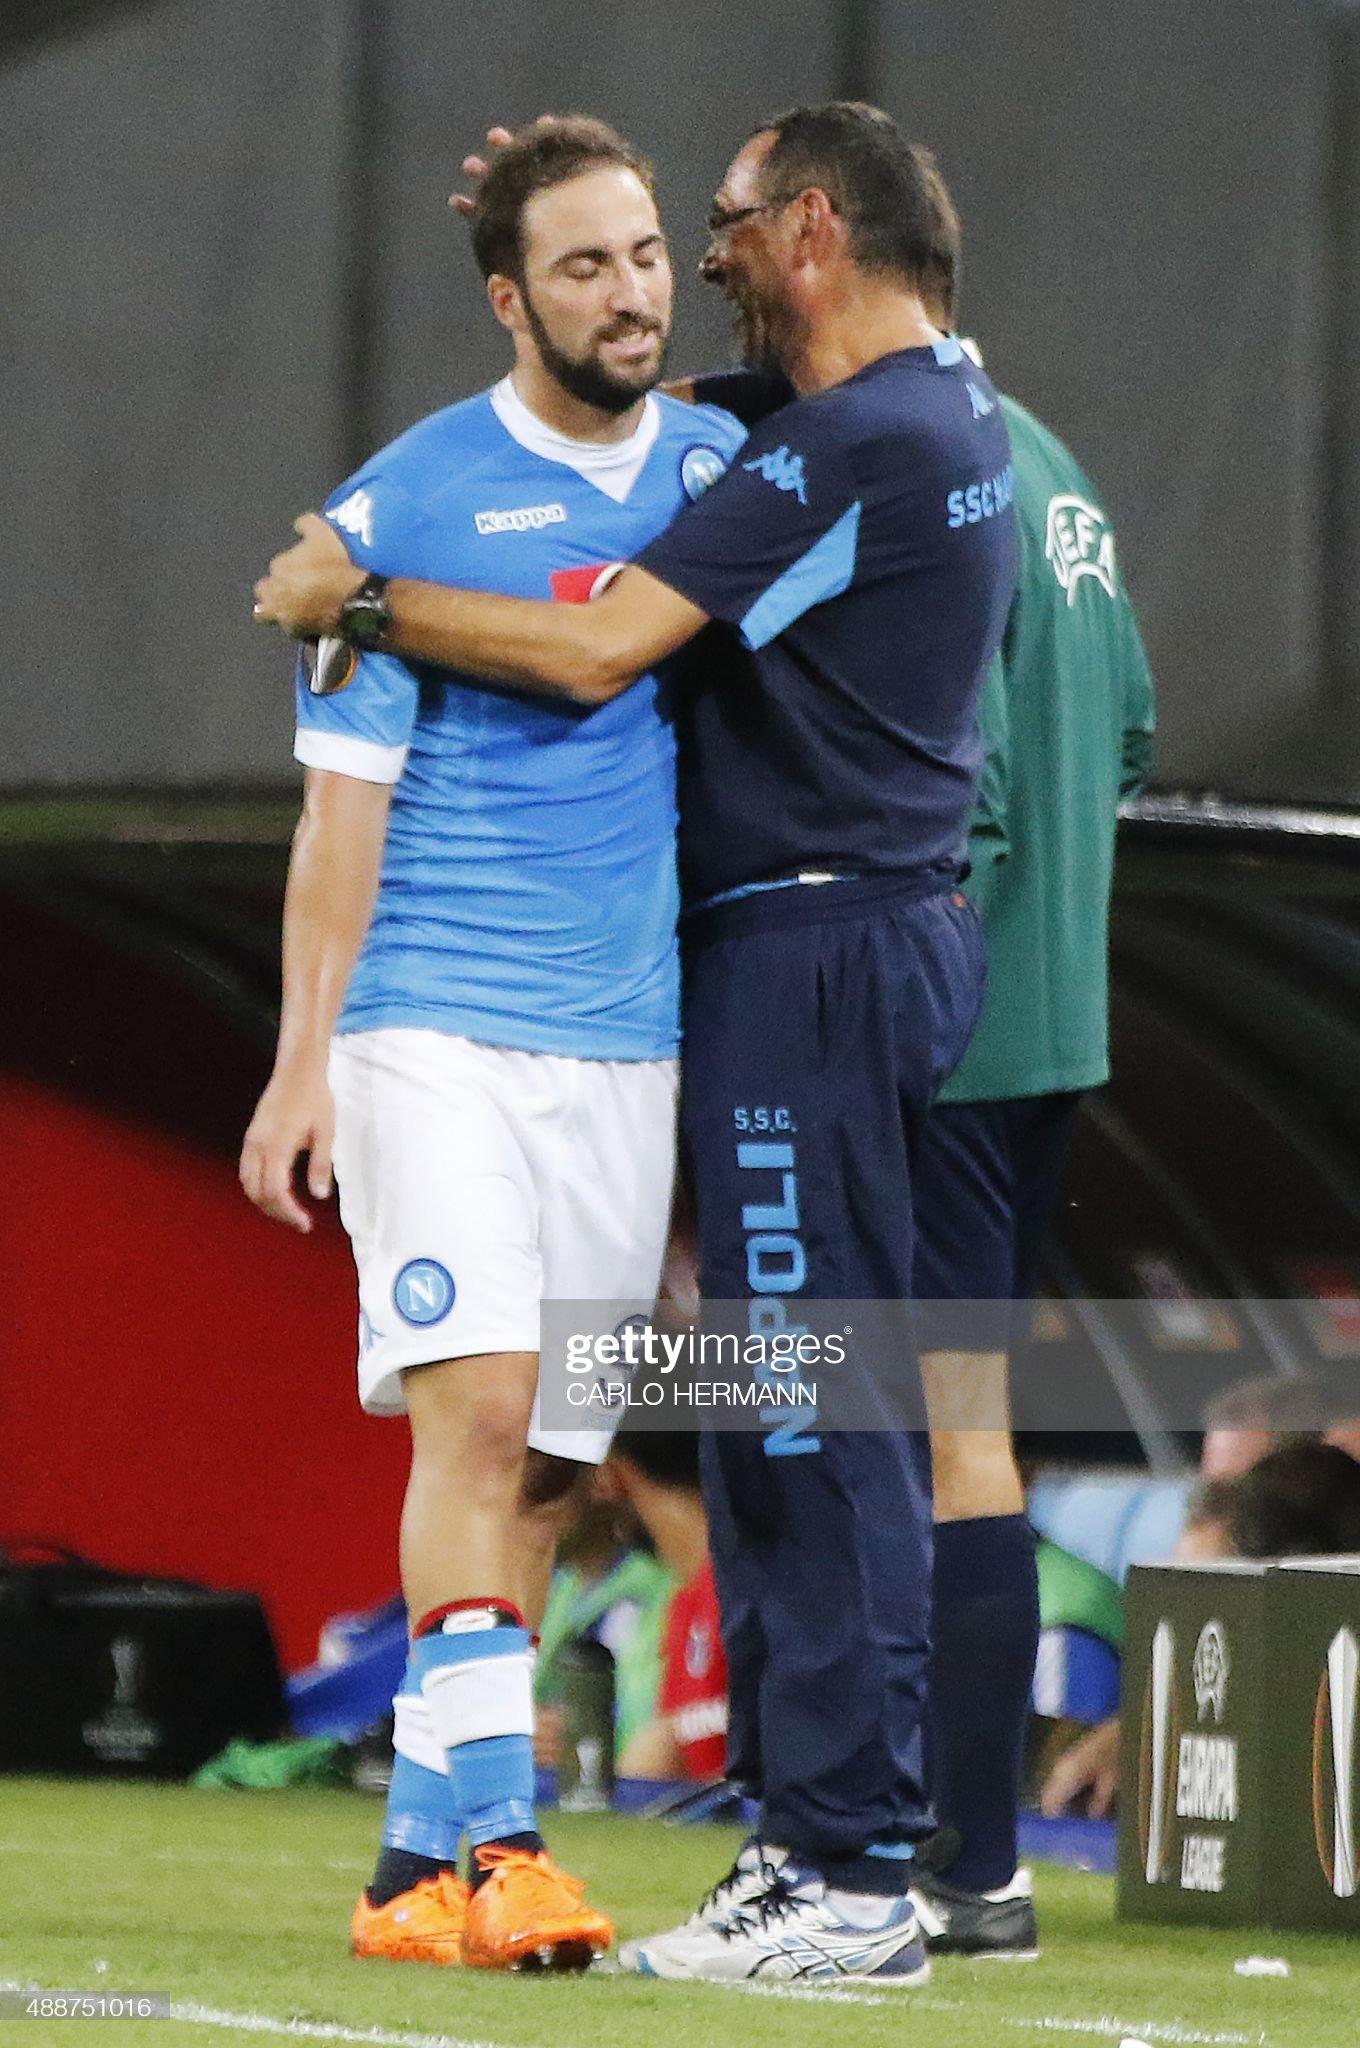 ¿Cuánto mide Maurizio Sarri? - Altura - Real height Napolis-italian-coach-maurizio-sarri-hugs-napolis-frenchargentinian-picture-id488751016?s=2048x2048